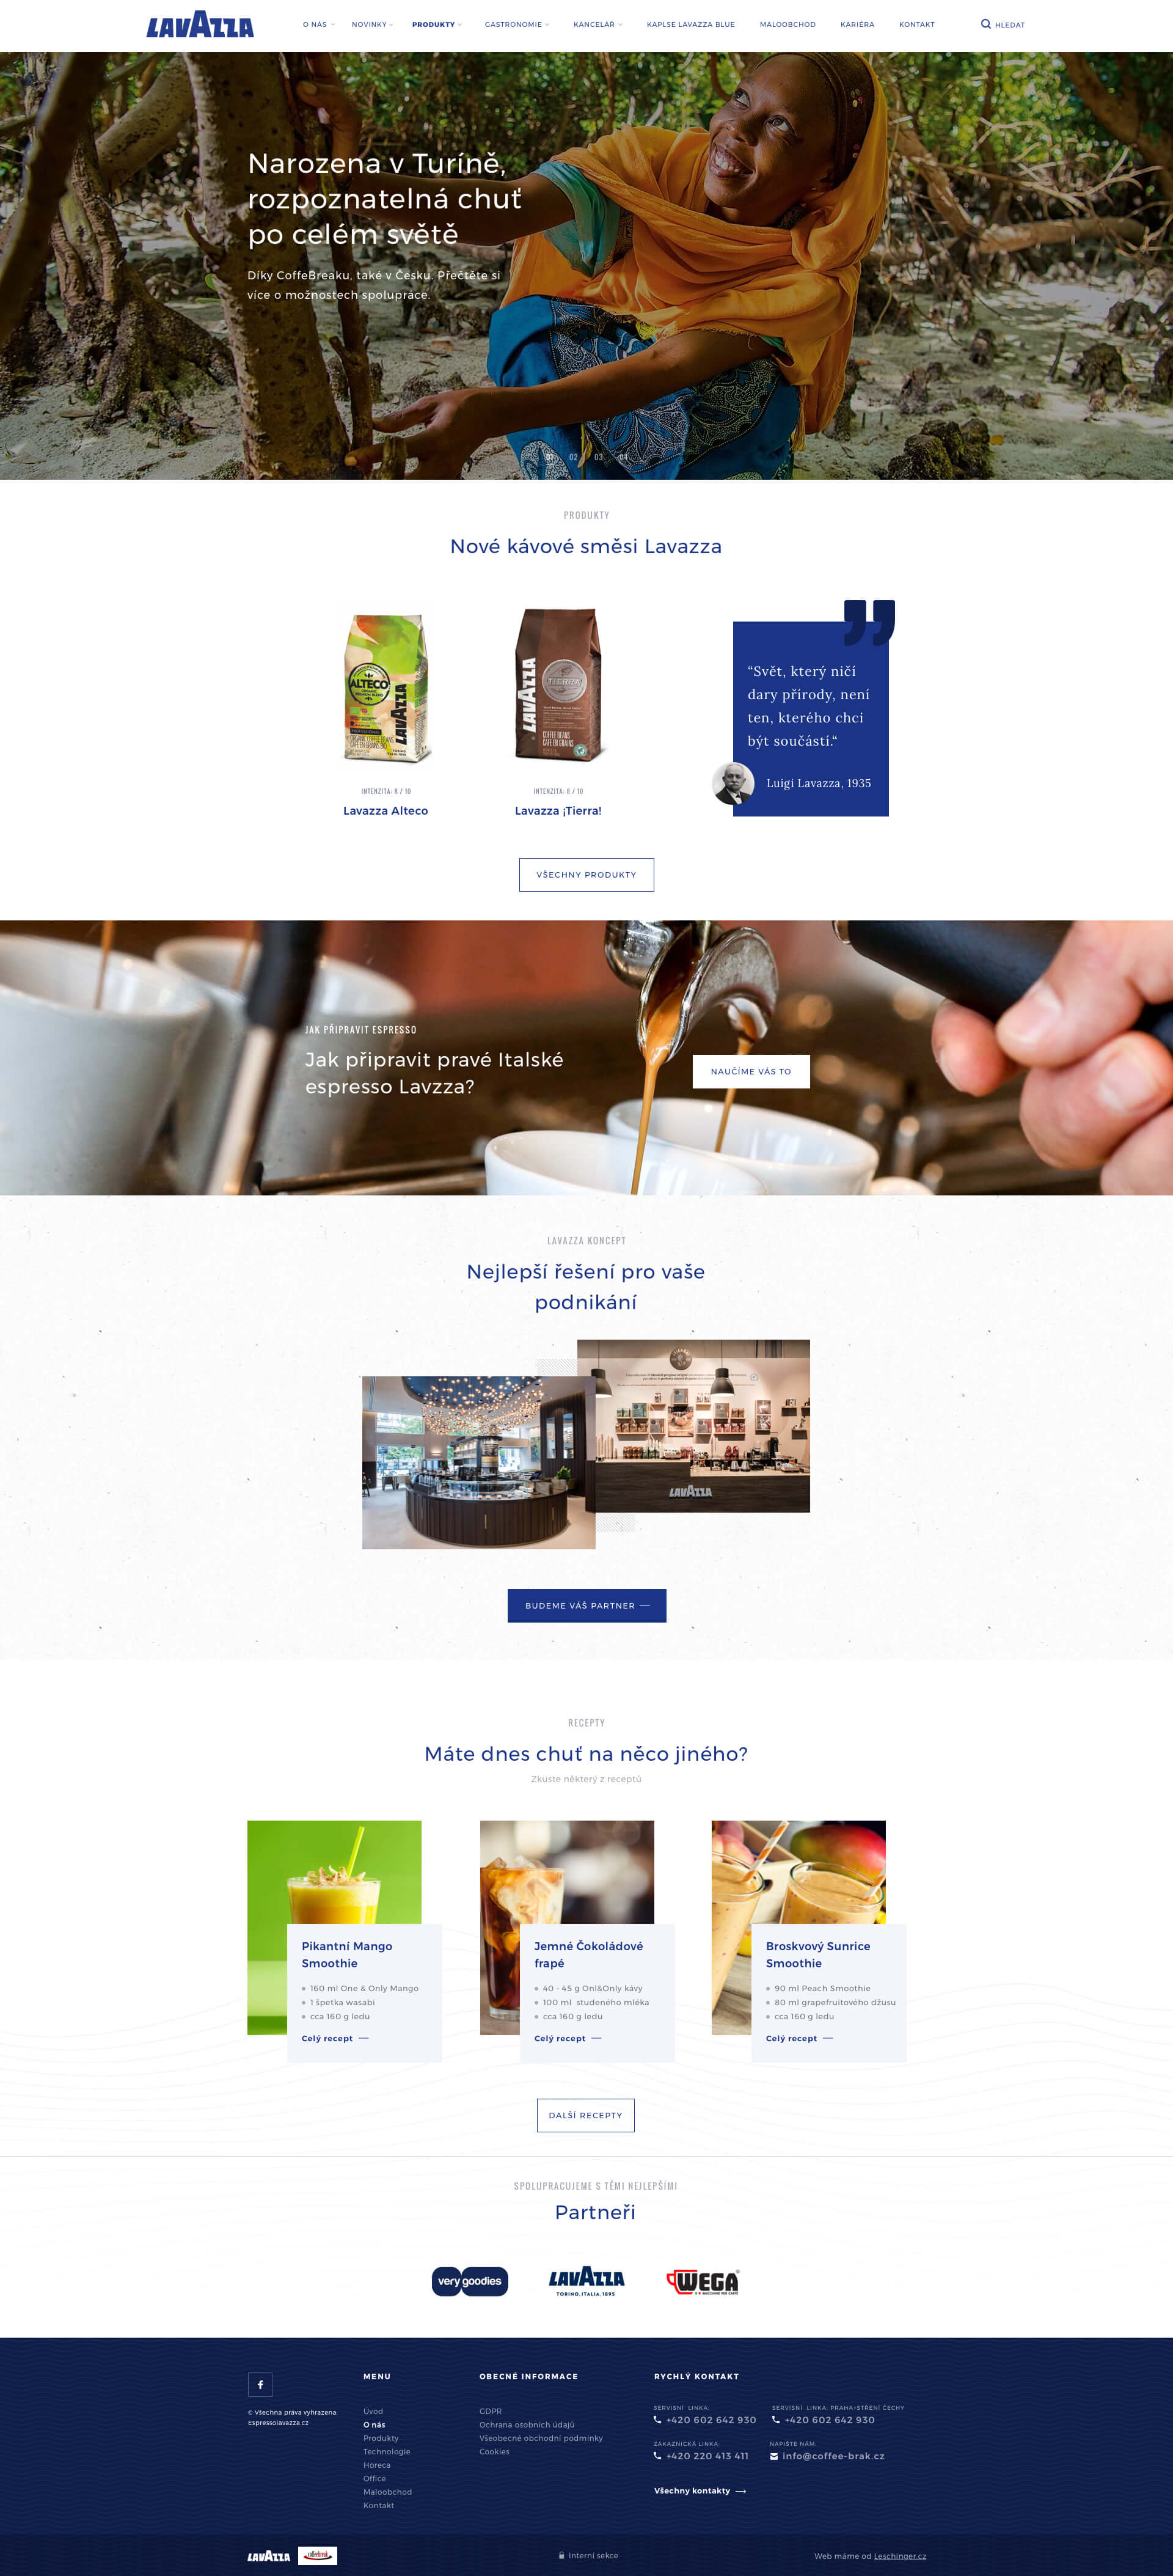 Tvorba Wordpress webu na míru pro Lavazza